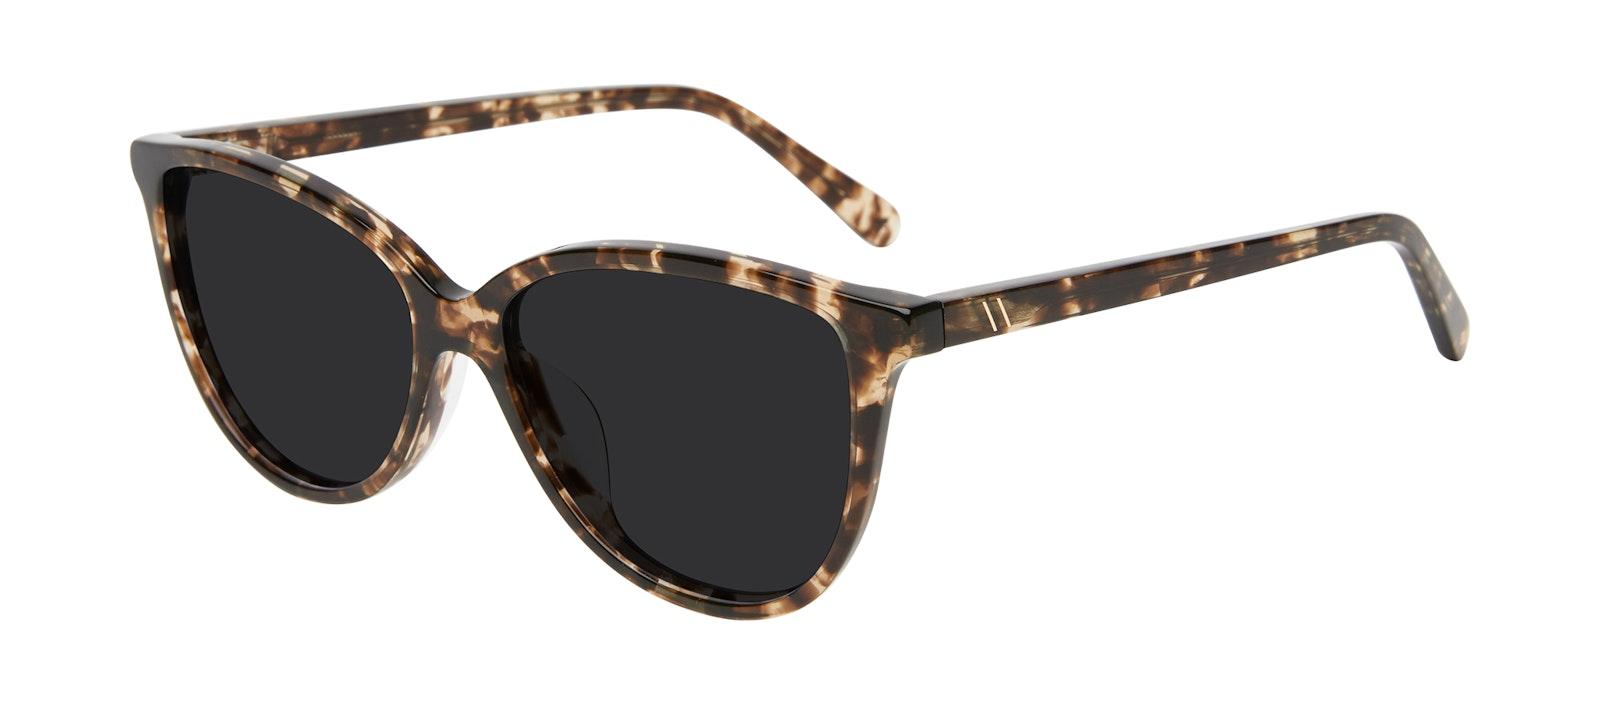 Affordable Fashion Glasses Cat Eye Sunglasses Women Tailor Leopard Tilt